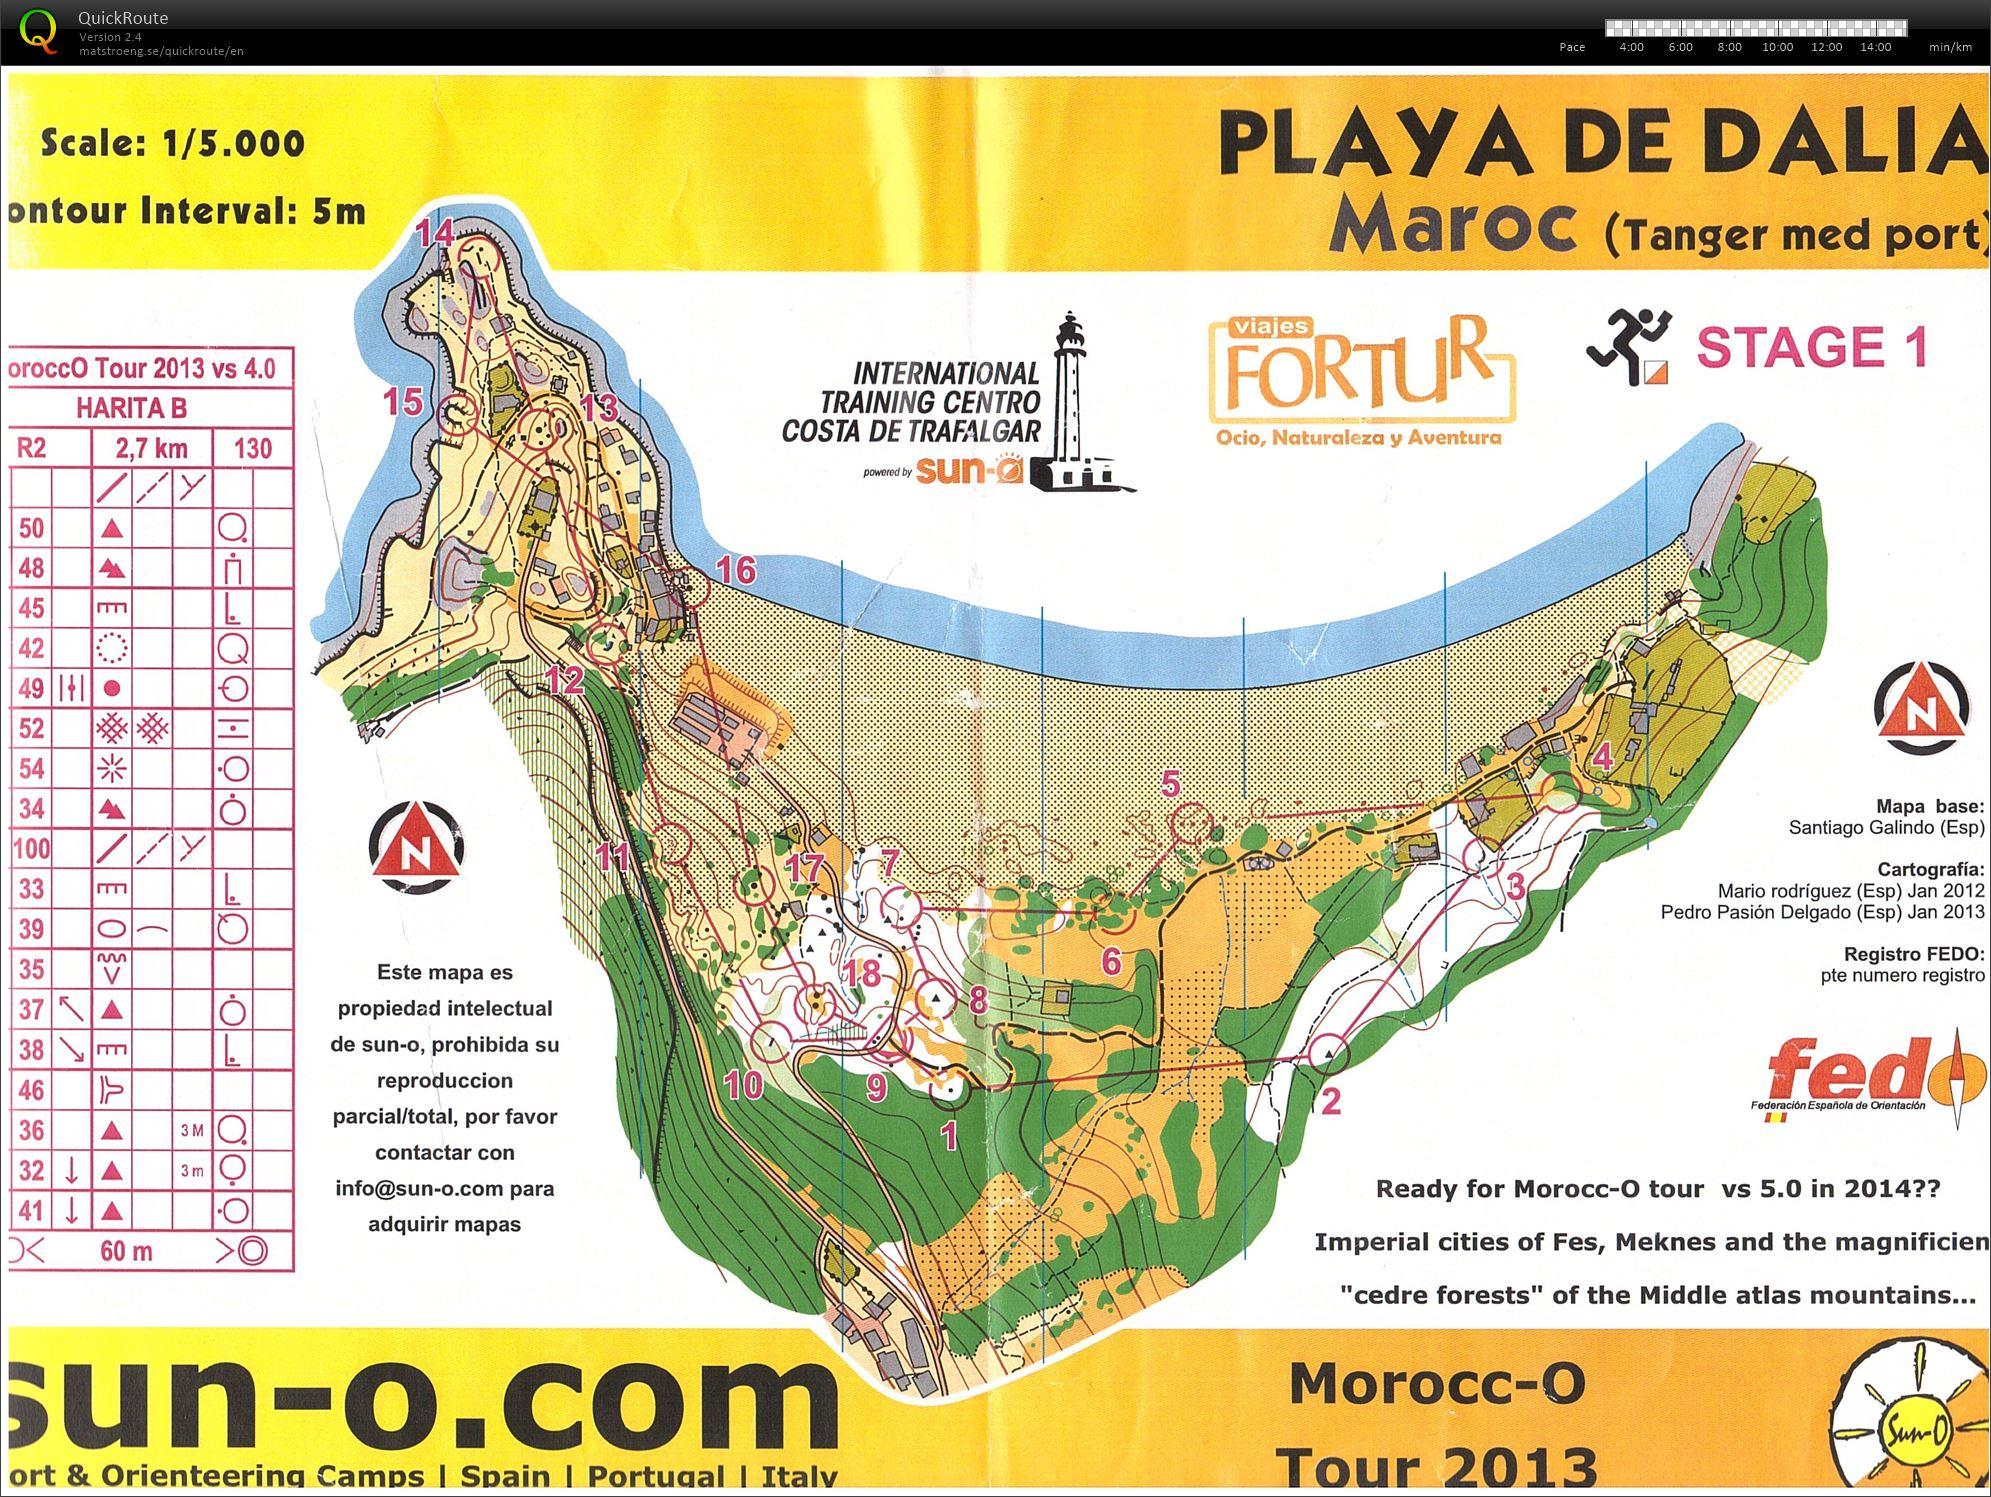 Playa de Dalia - orienteerin map - tanger - Morocco